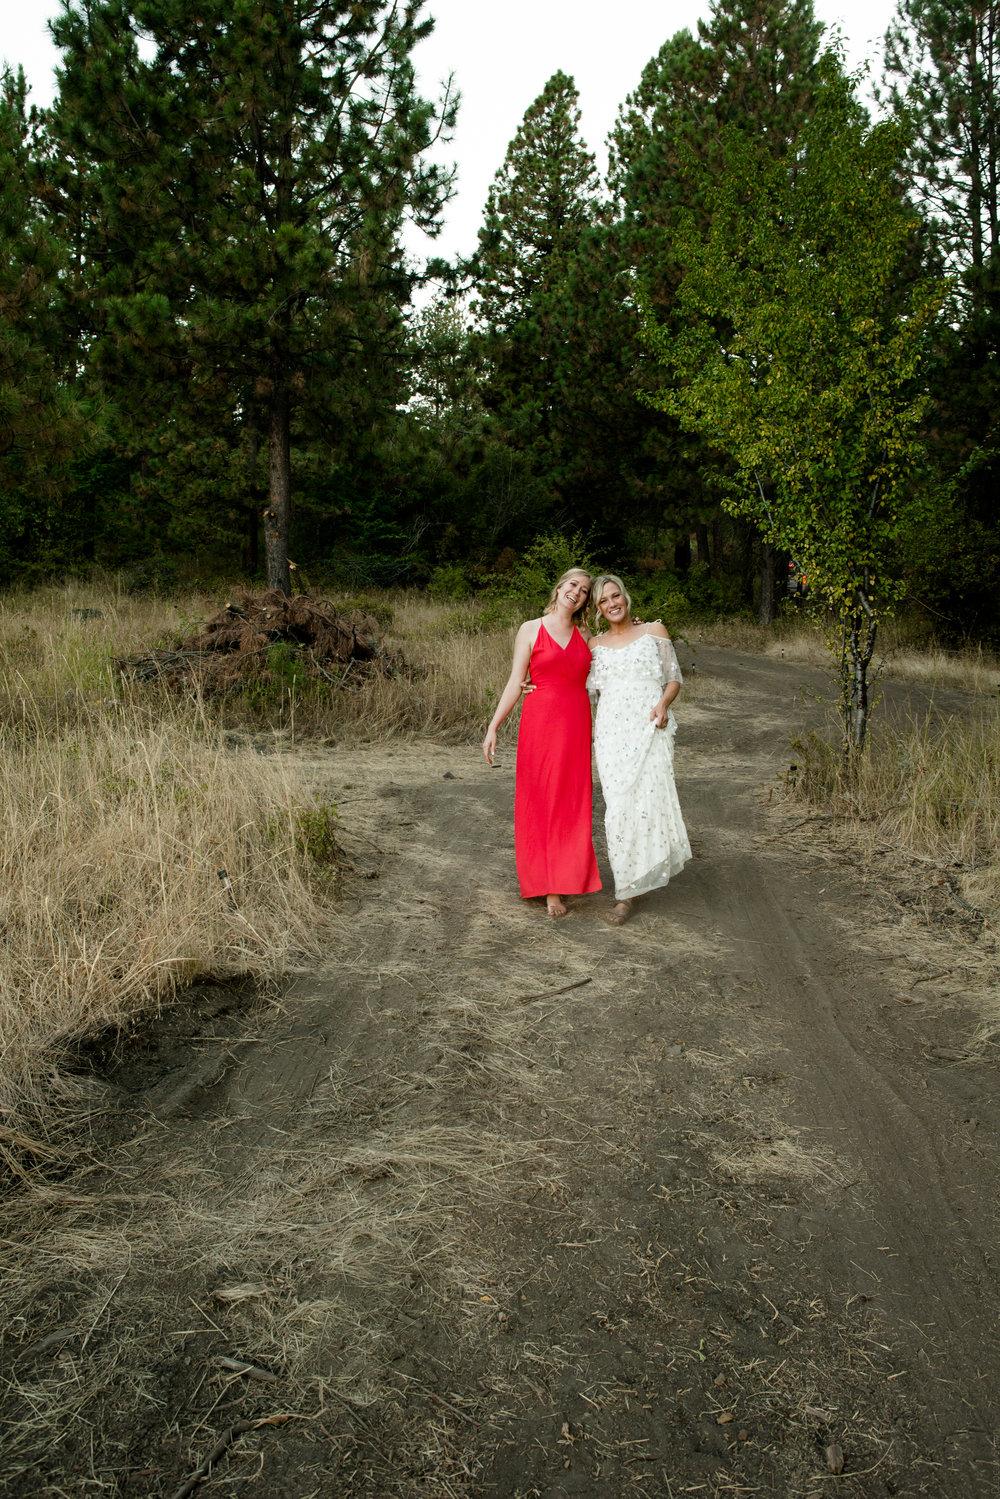 Lana Micah Wedding La Grande Oregon September 2018 Please Credit Talia Jean Galvin (471 of 687).jpg